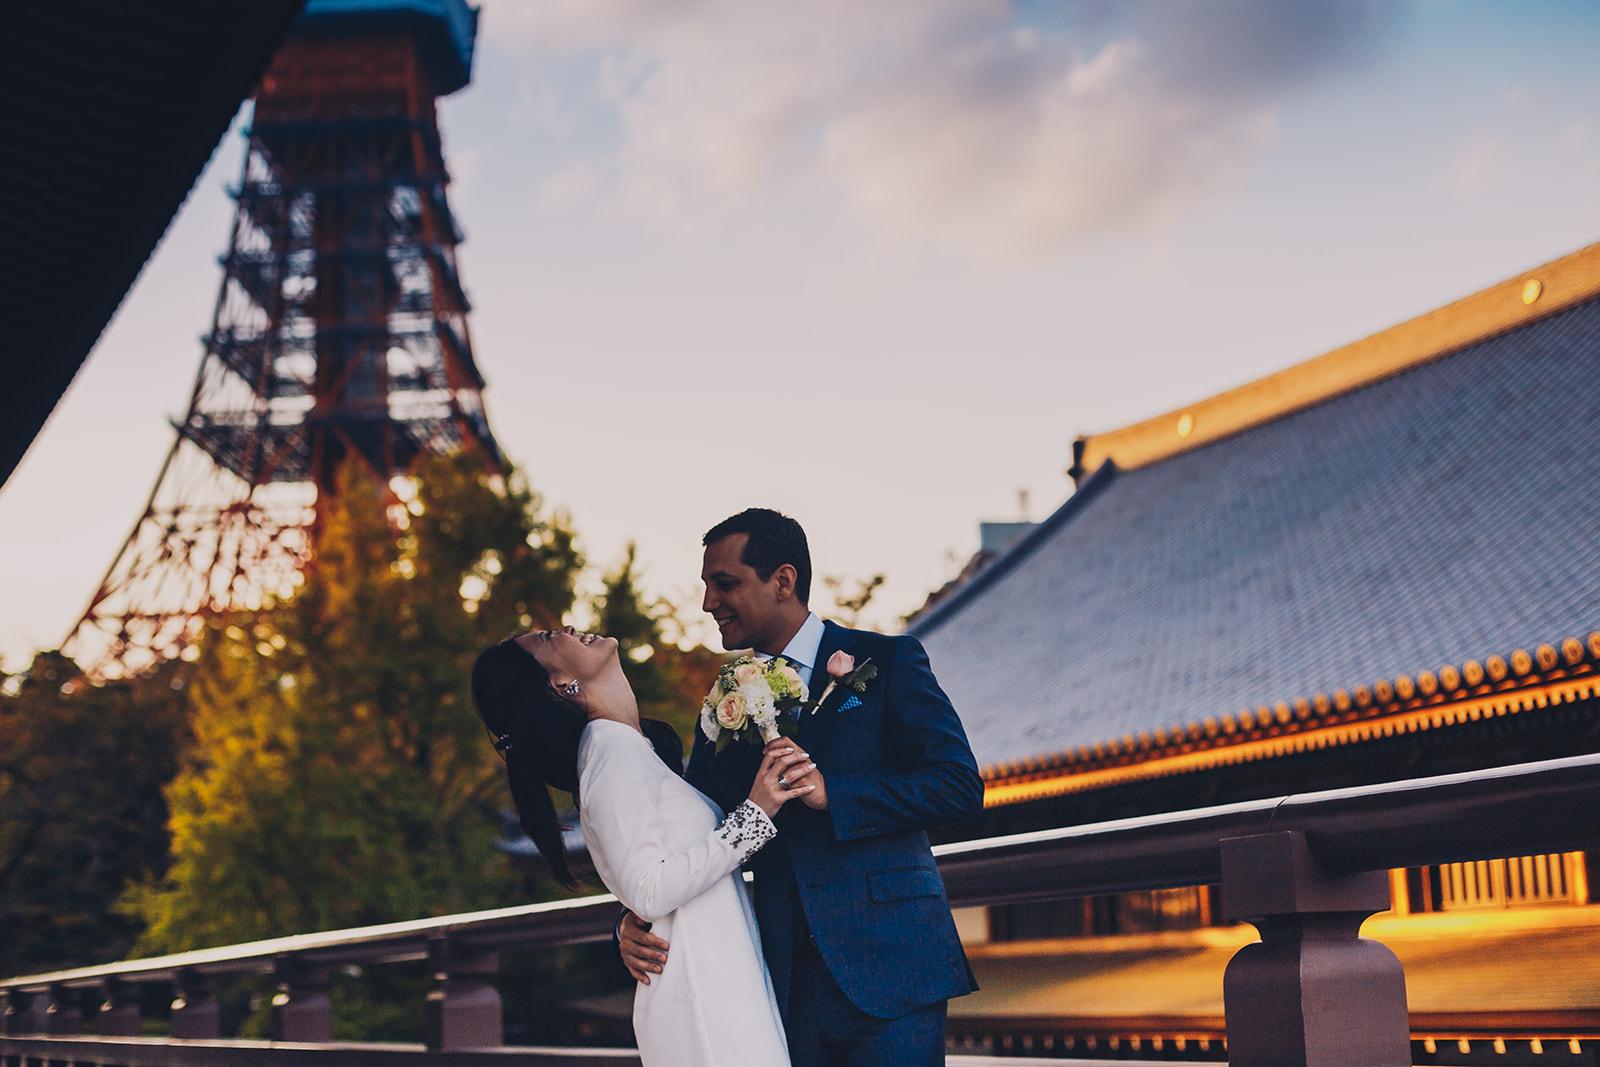 Prewedding pre wedding engagement in Tokyo Japan hire photographer (9).jpg